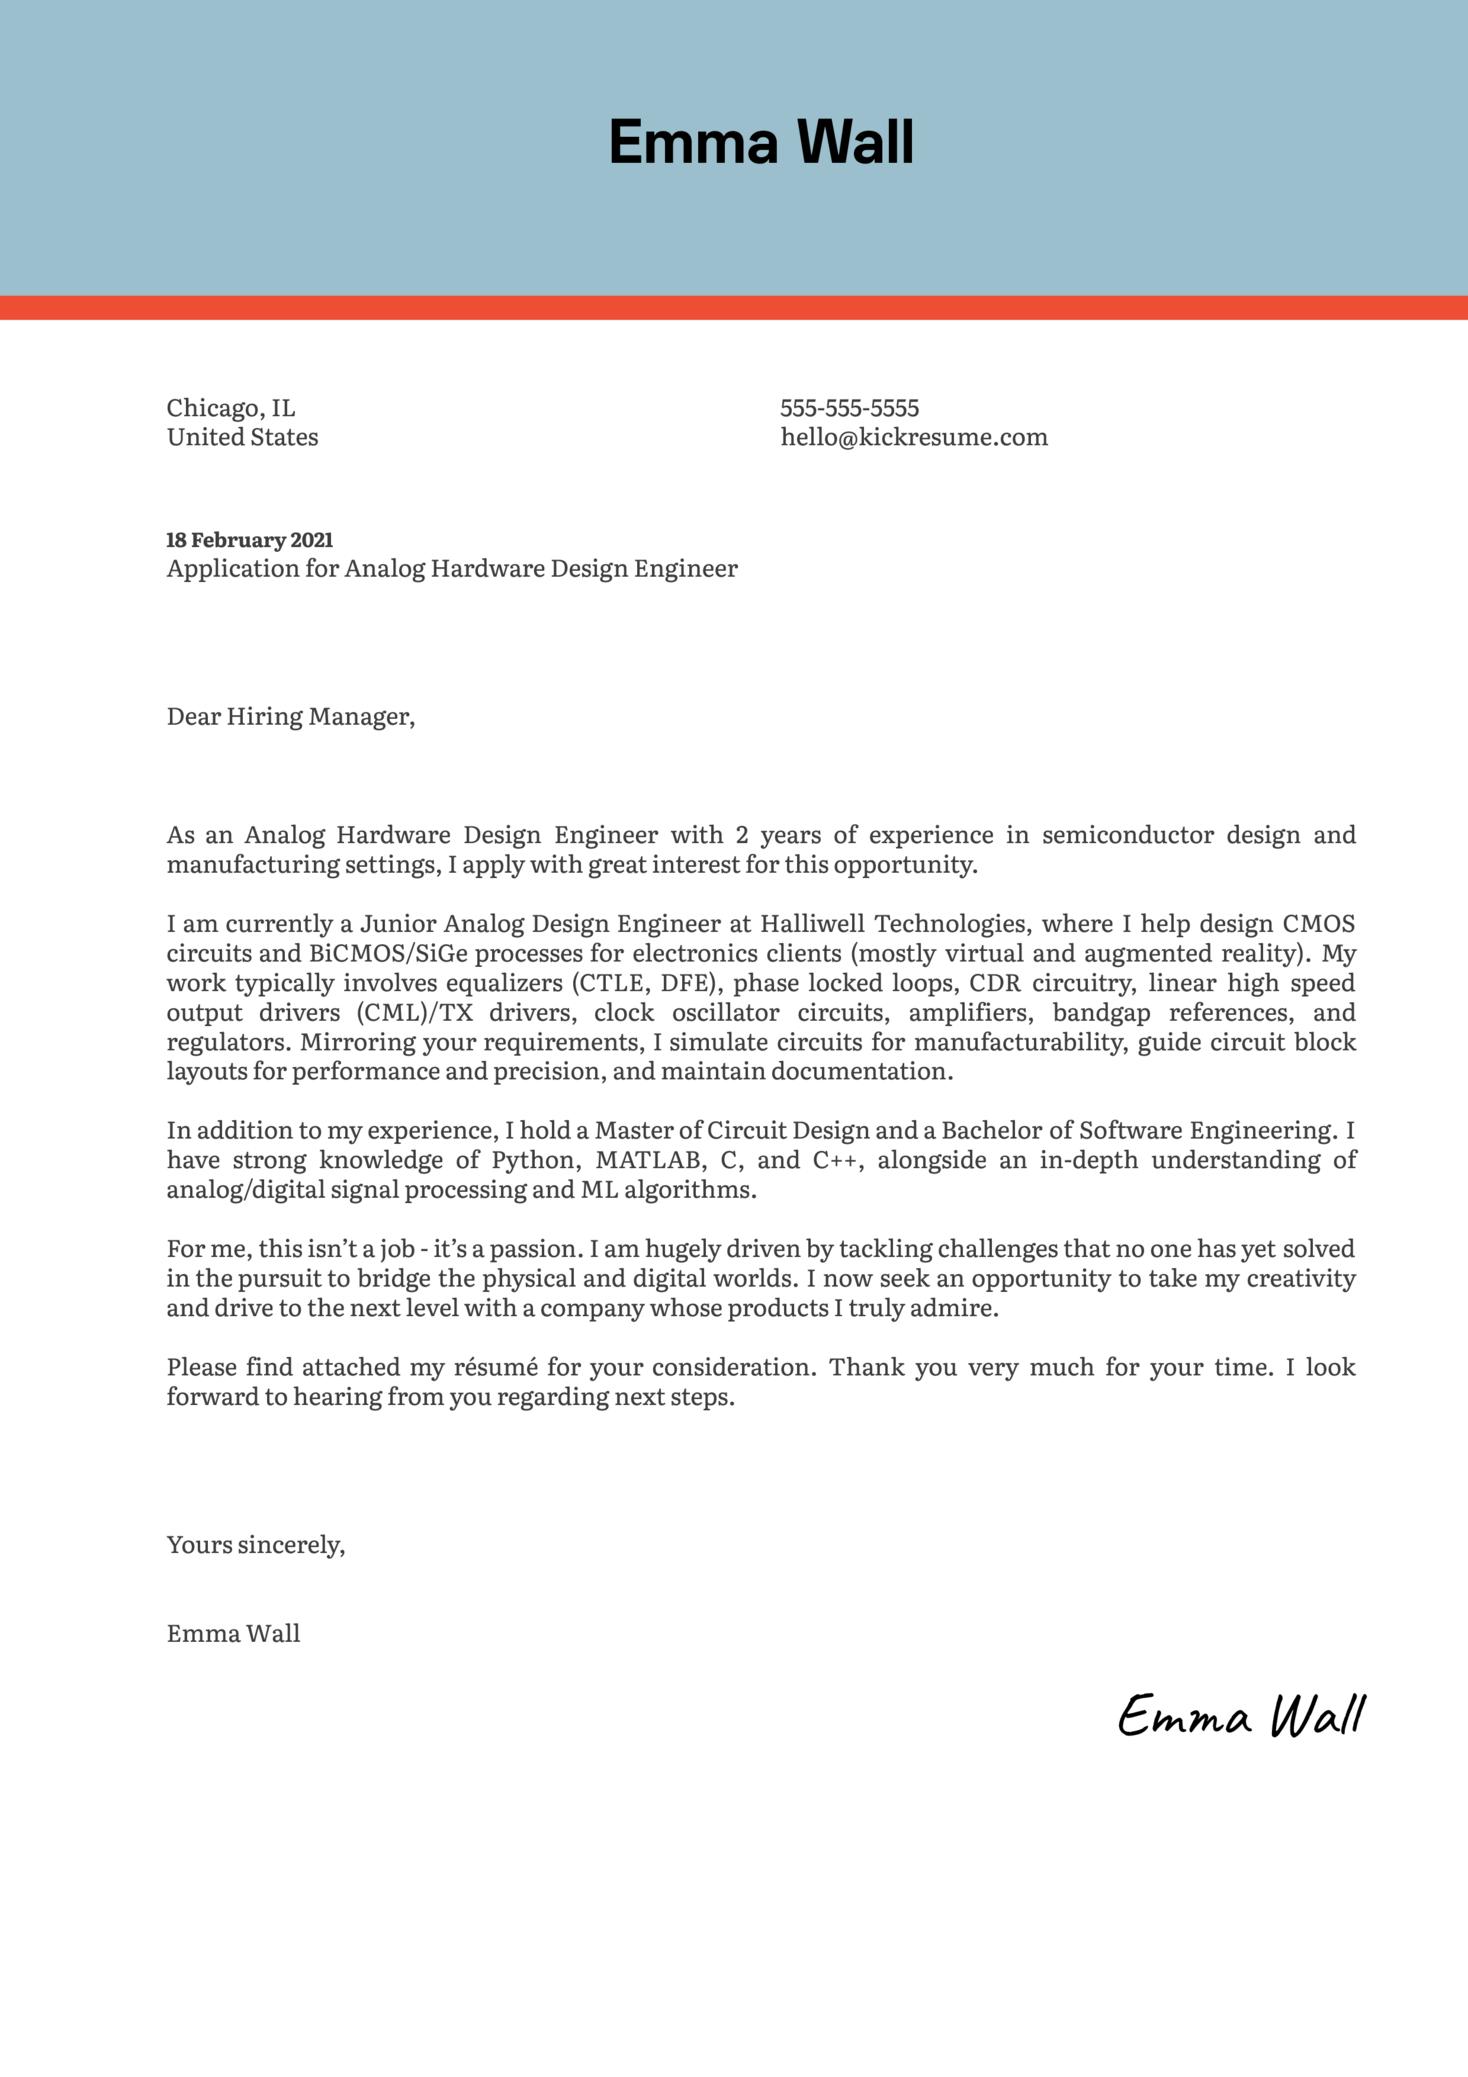 Analog Hardware Design Engineer Cover Letter Sample